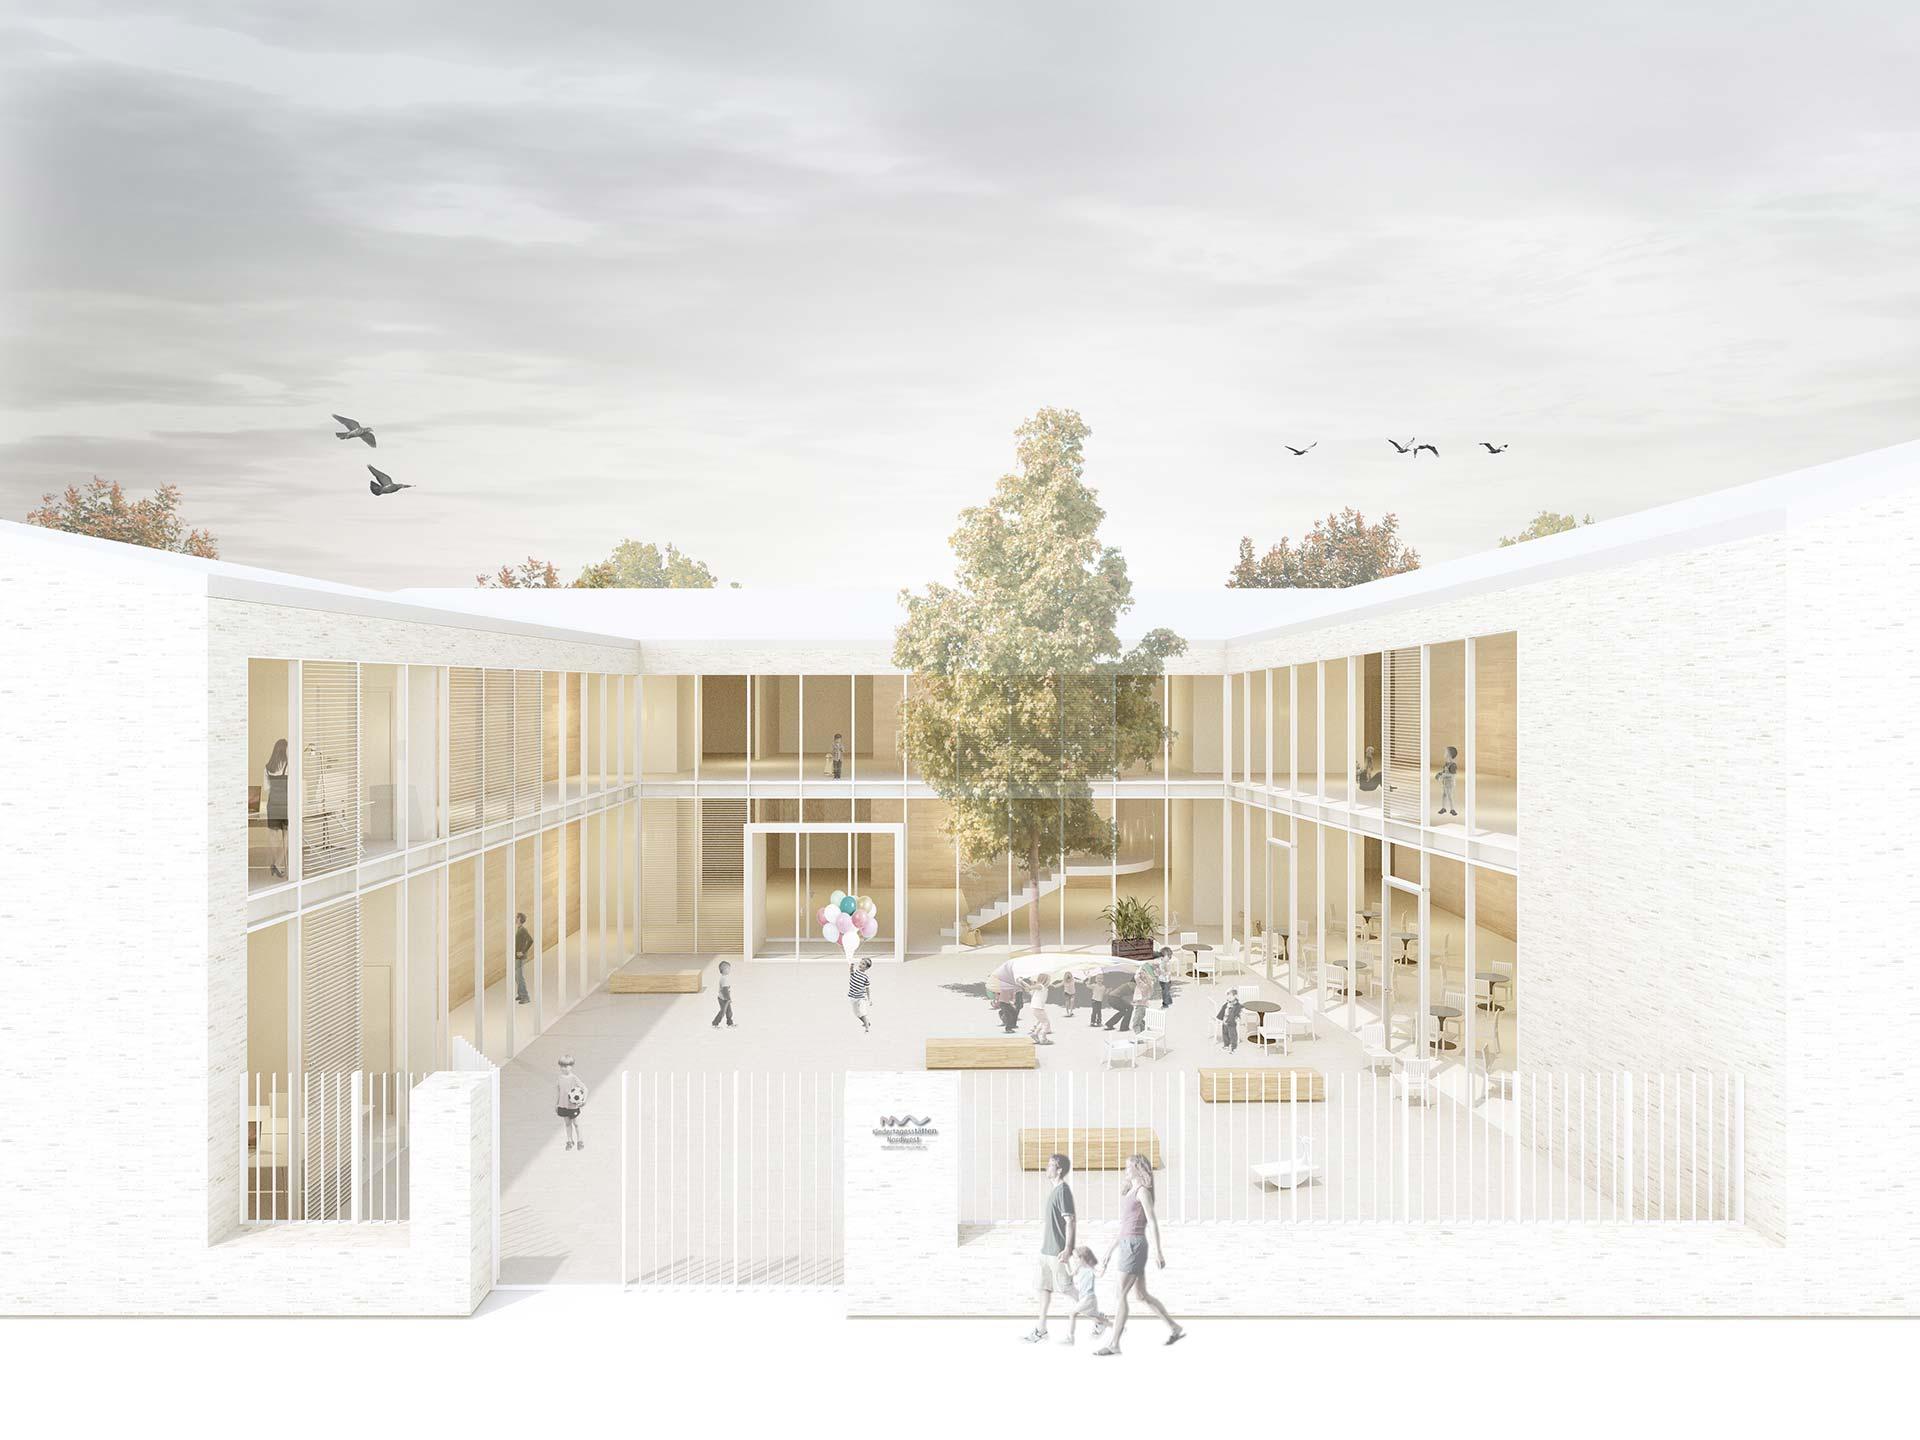 Ksv ein haus f r kinder for Design hotel quedlinburg